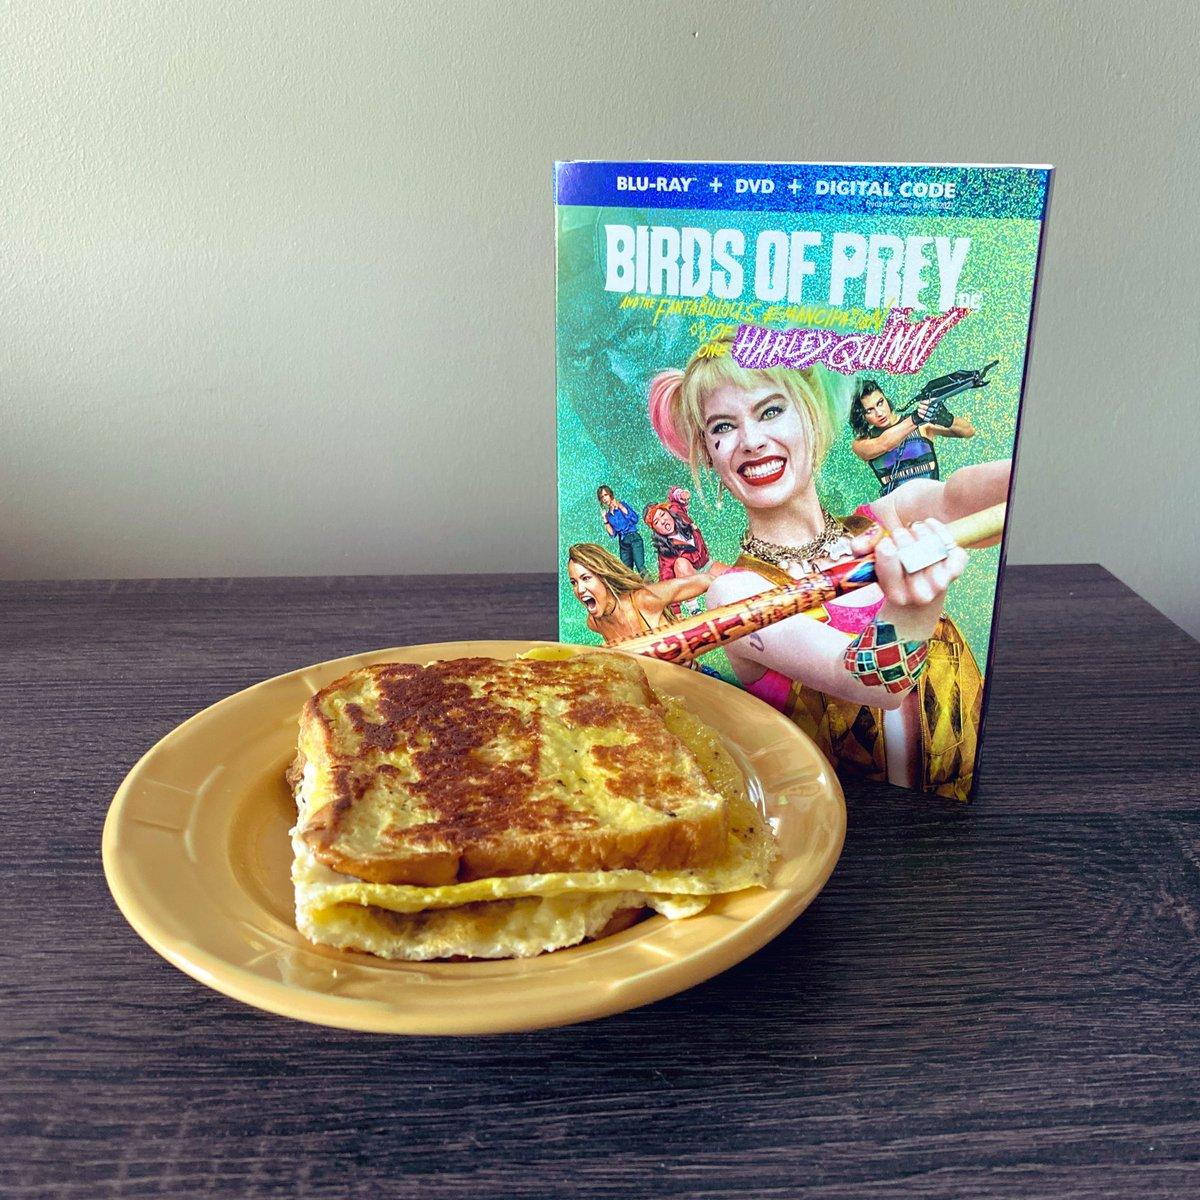 Matt Neglia On Twitter I Made That Famous Tiktok Egg Breakfast Sandwich To Celebrate My Bluray Purchase Of Birdsofprey I Think Harley Quinn Would Approve Margotrobbie Filmtwitter Https T Co Tep5fcdb4s